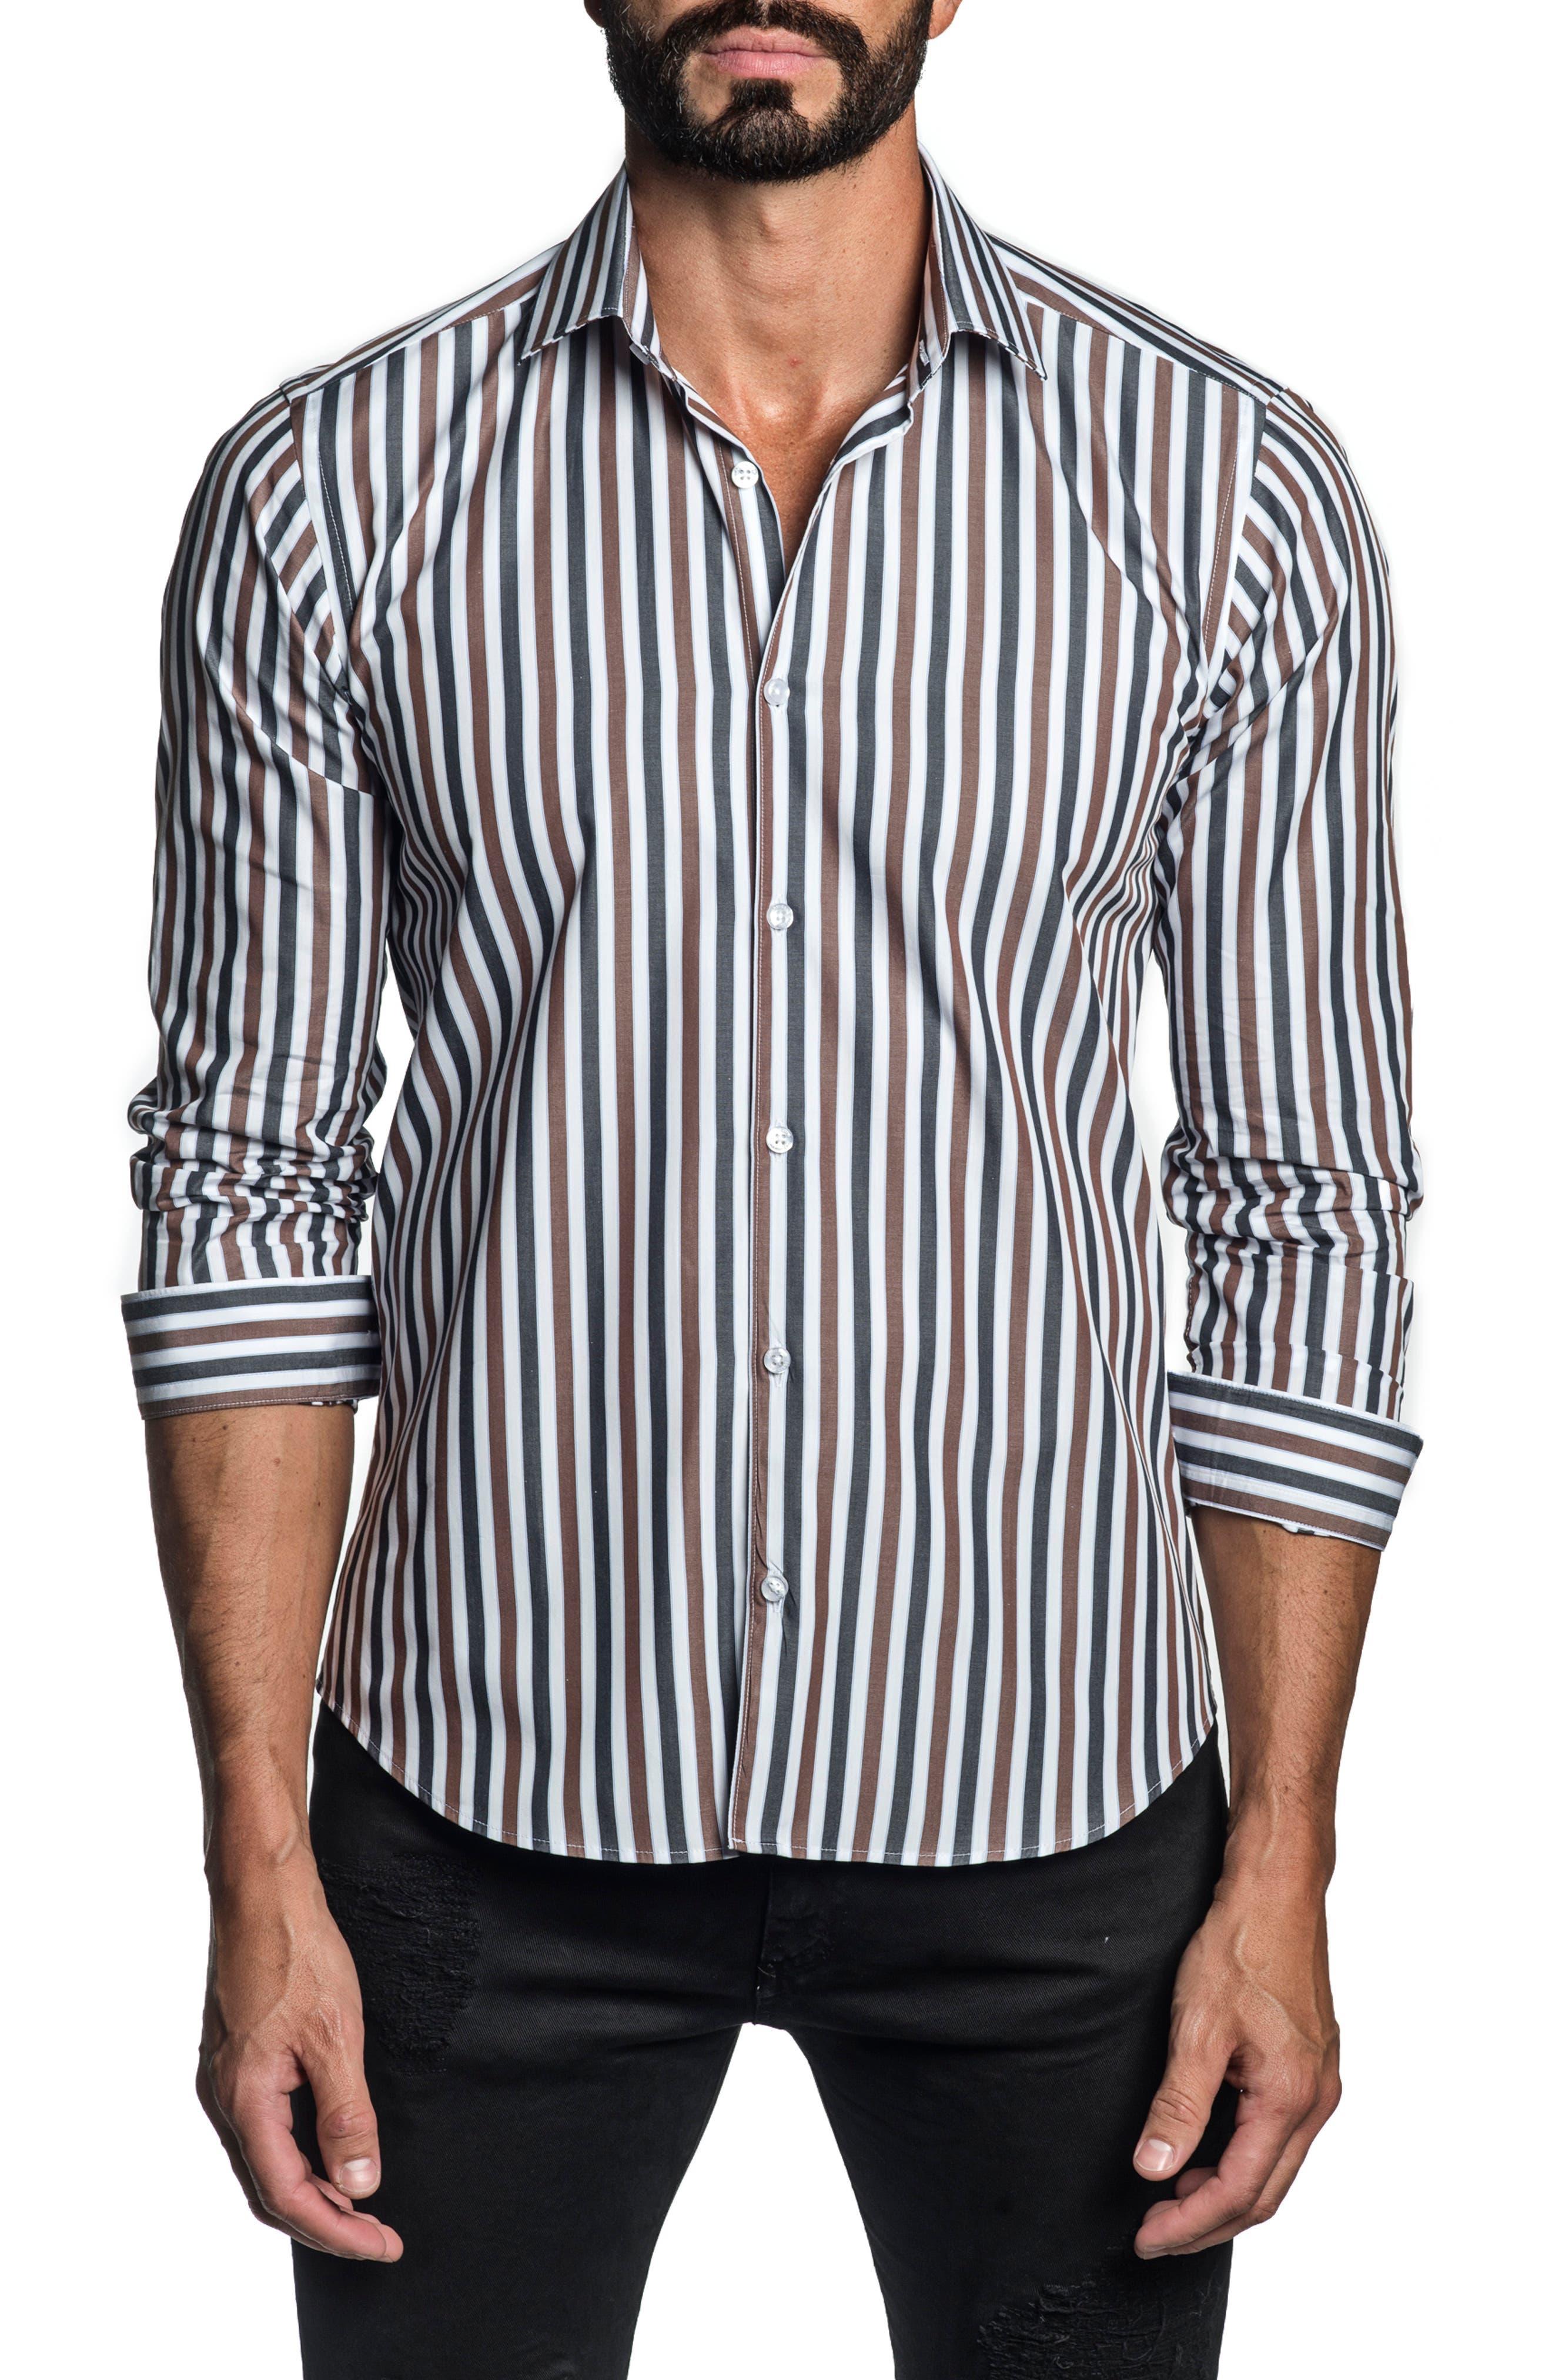 Trim Fit Stripe Button-Up Shirt